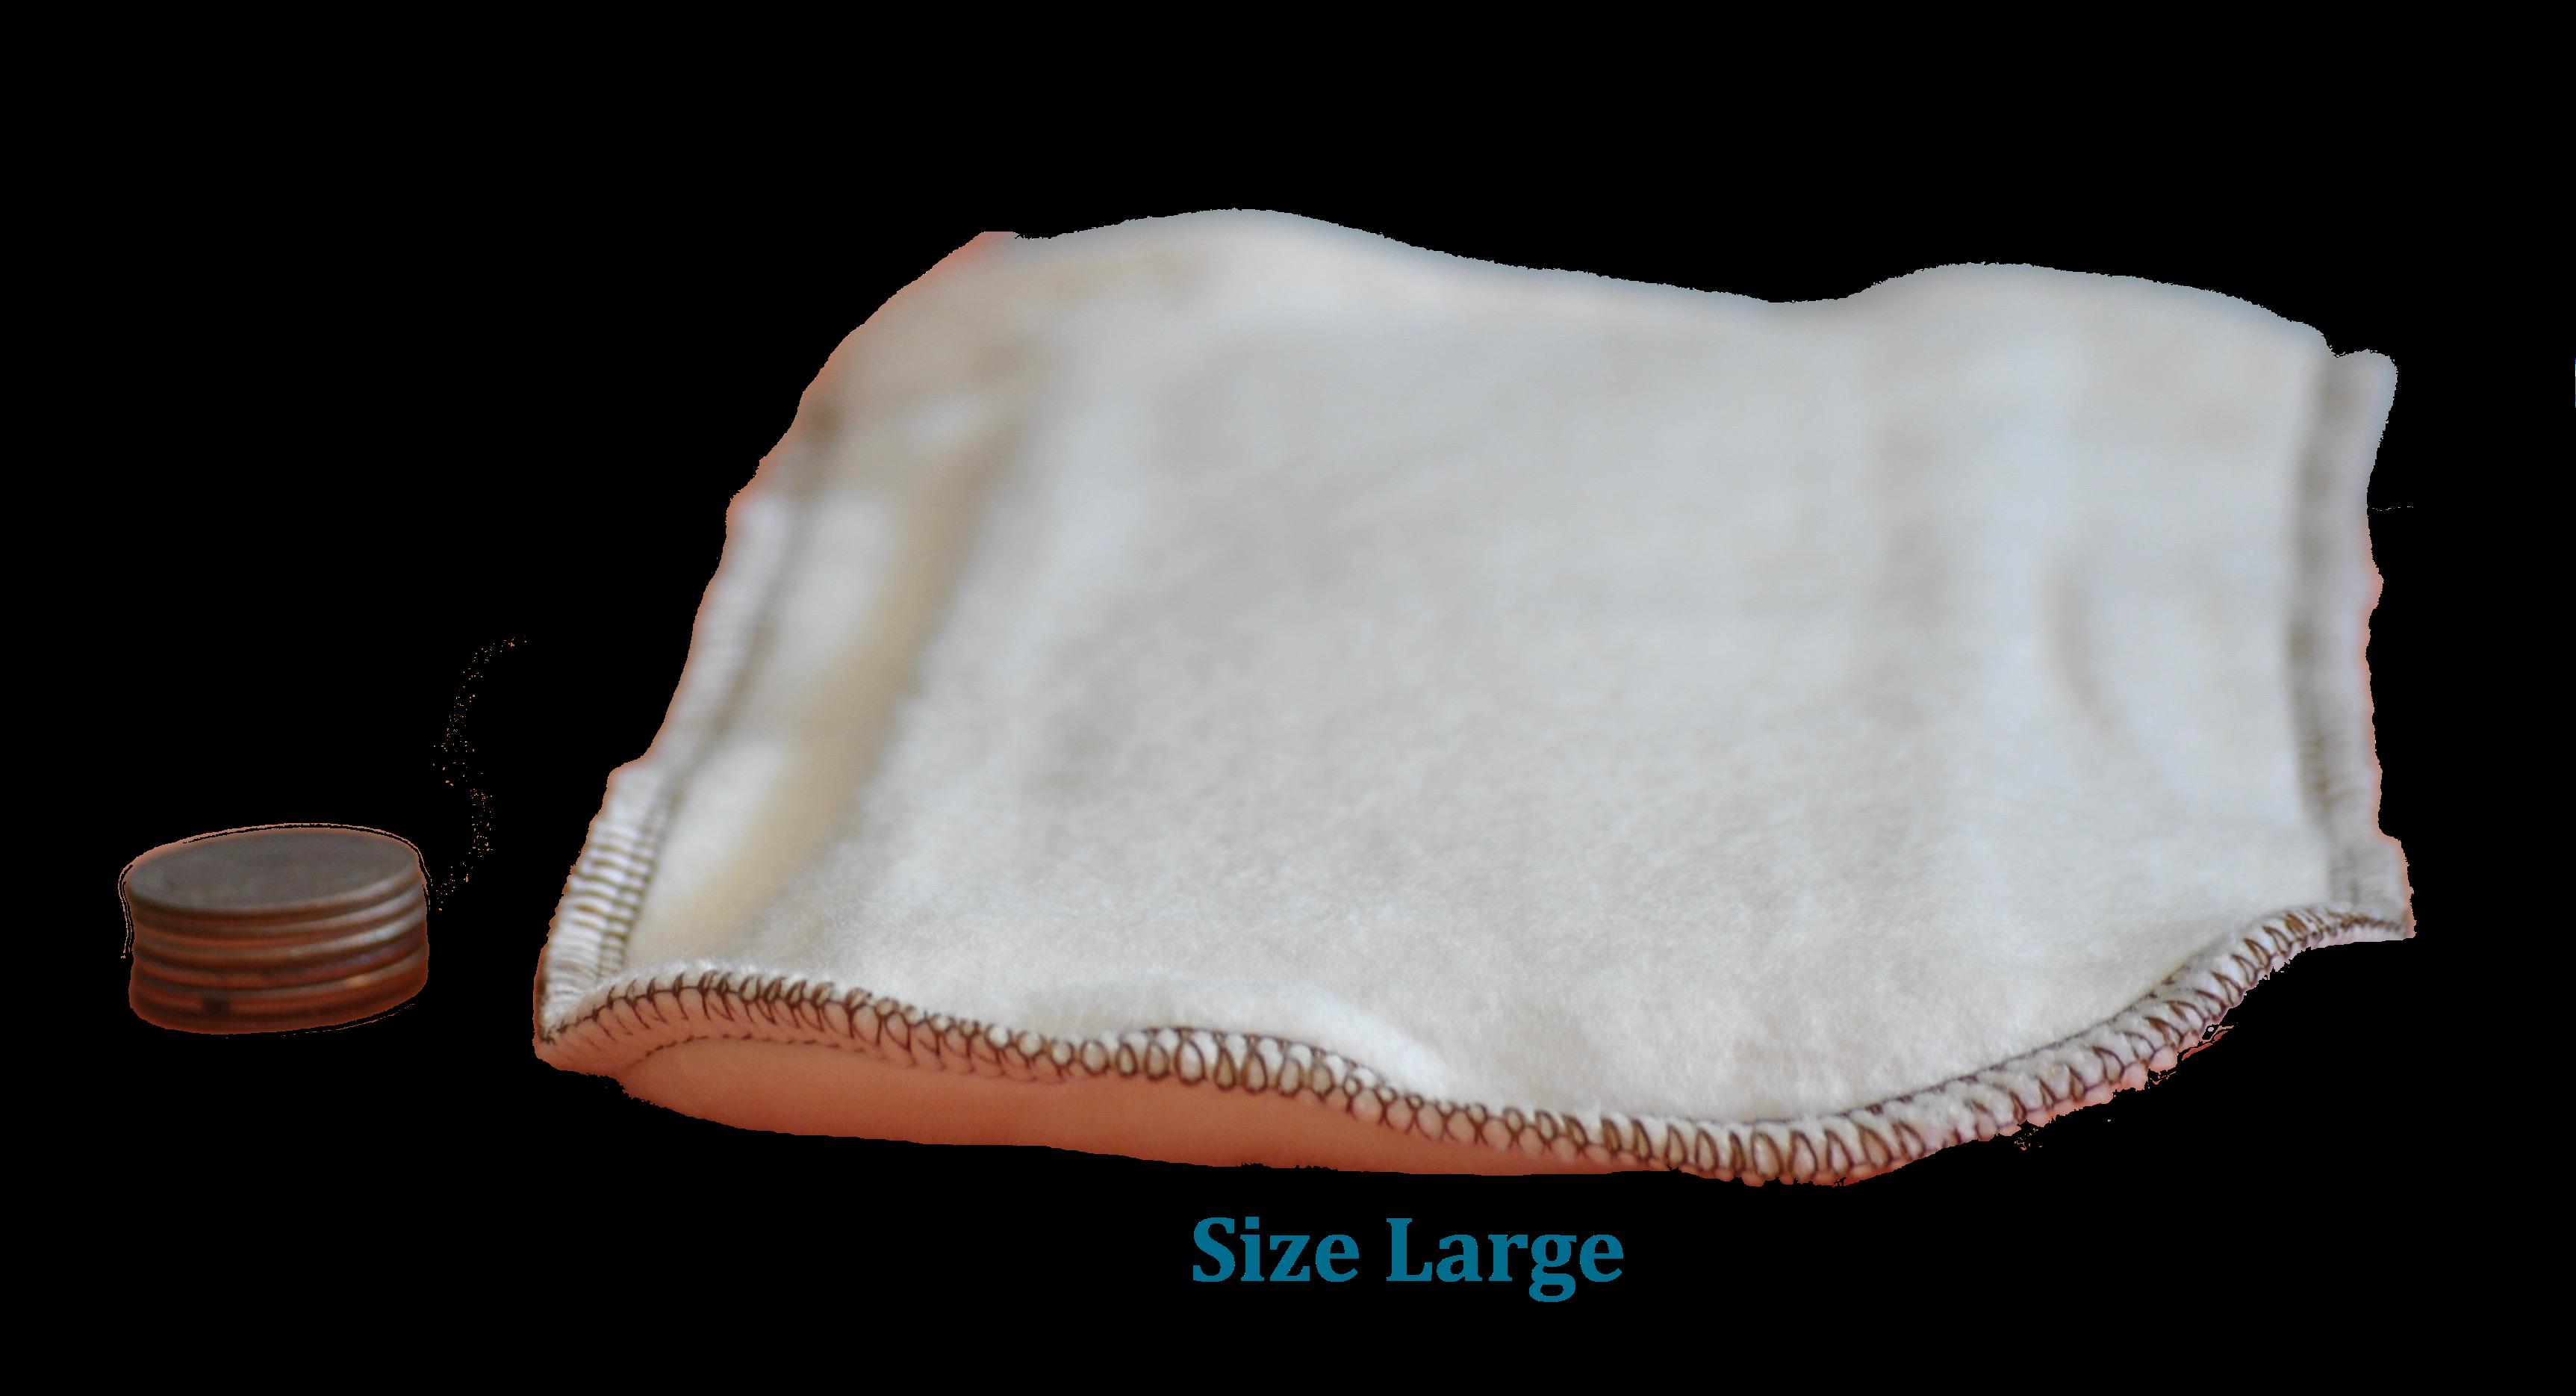 Hemp/ Organic Cotton Pocket Duo Cloth Diaper & Potty-Training Inserts- 2 Pack: 1 Size Small/1 Size Large